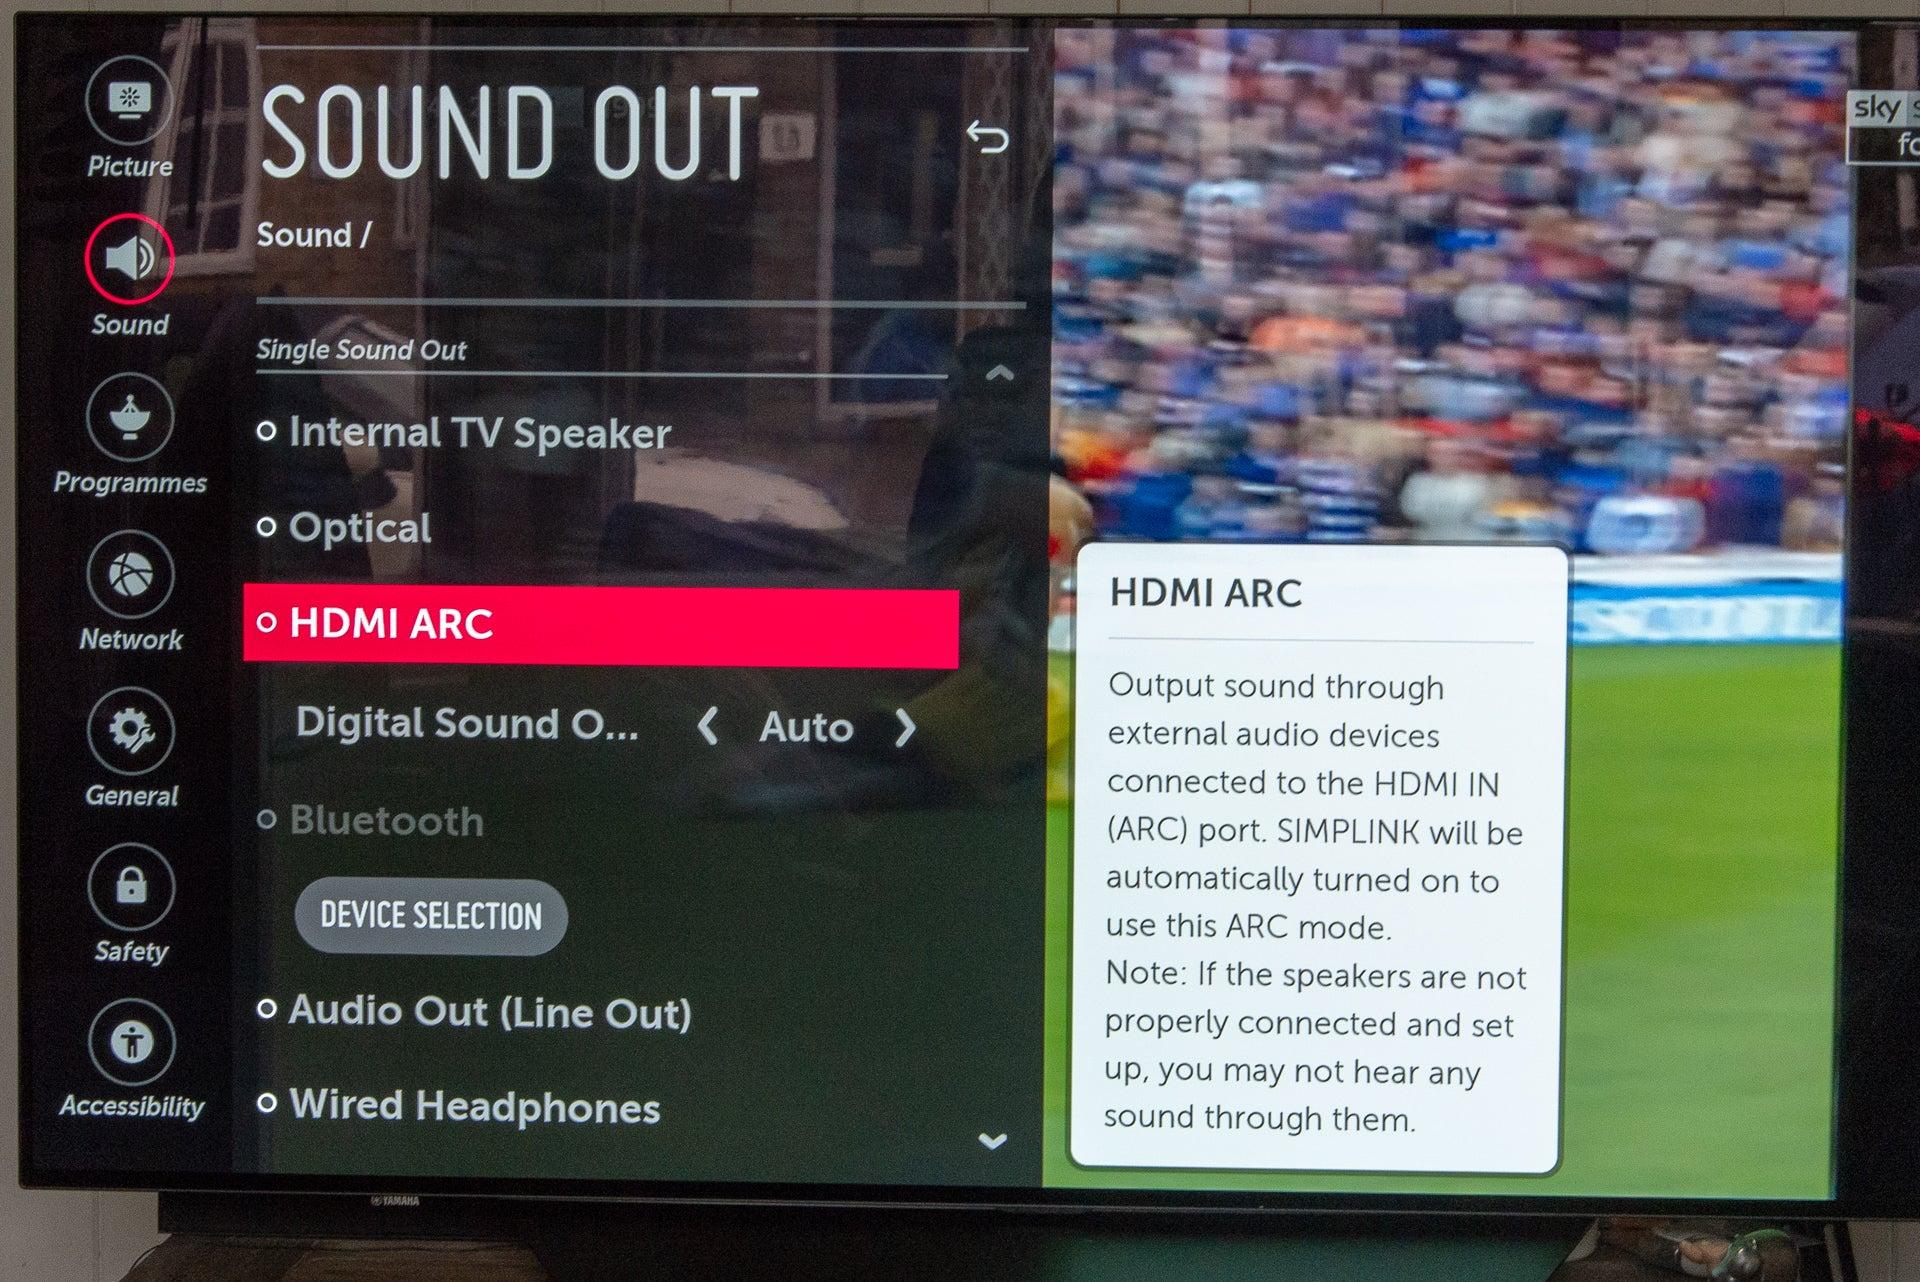 HDMI ARC enable